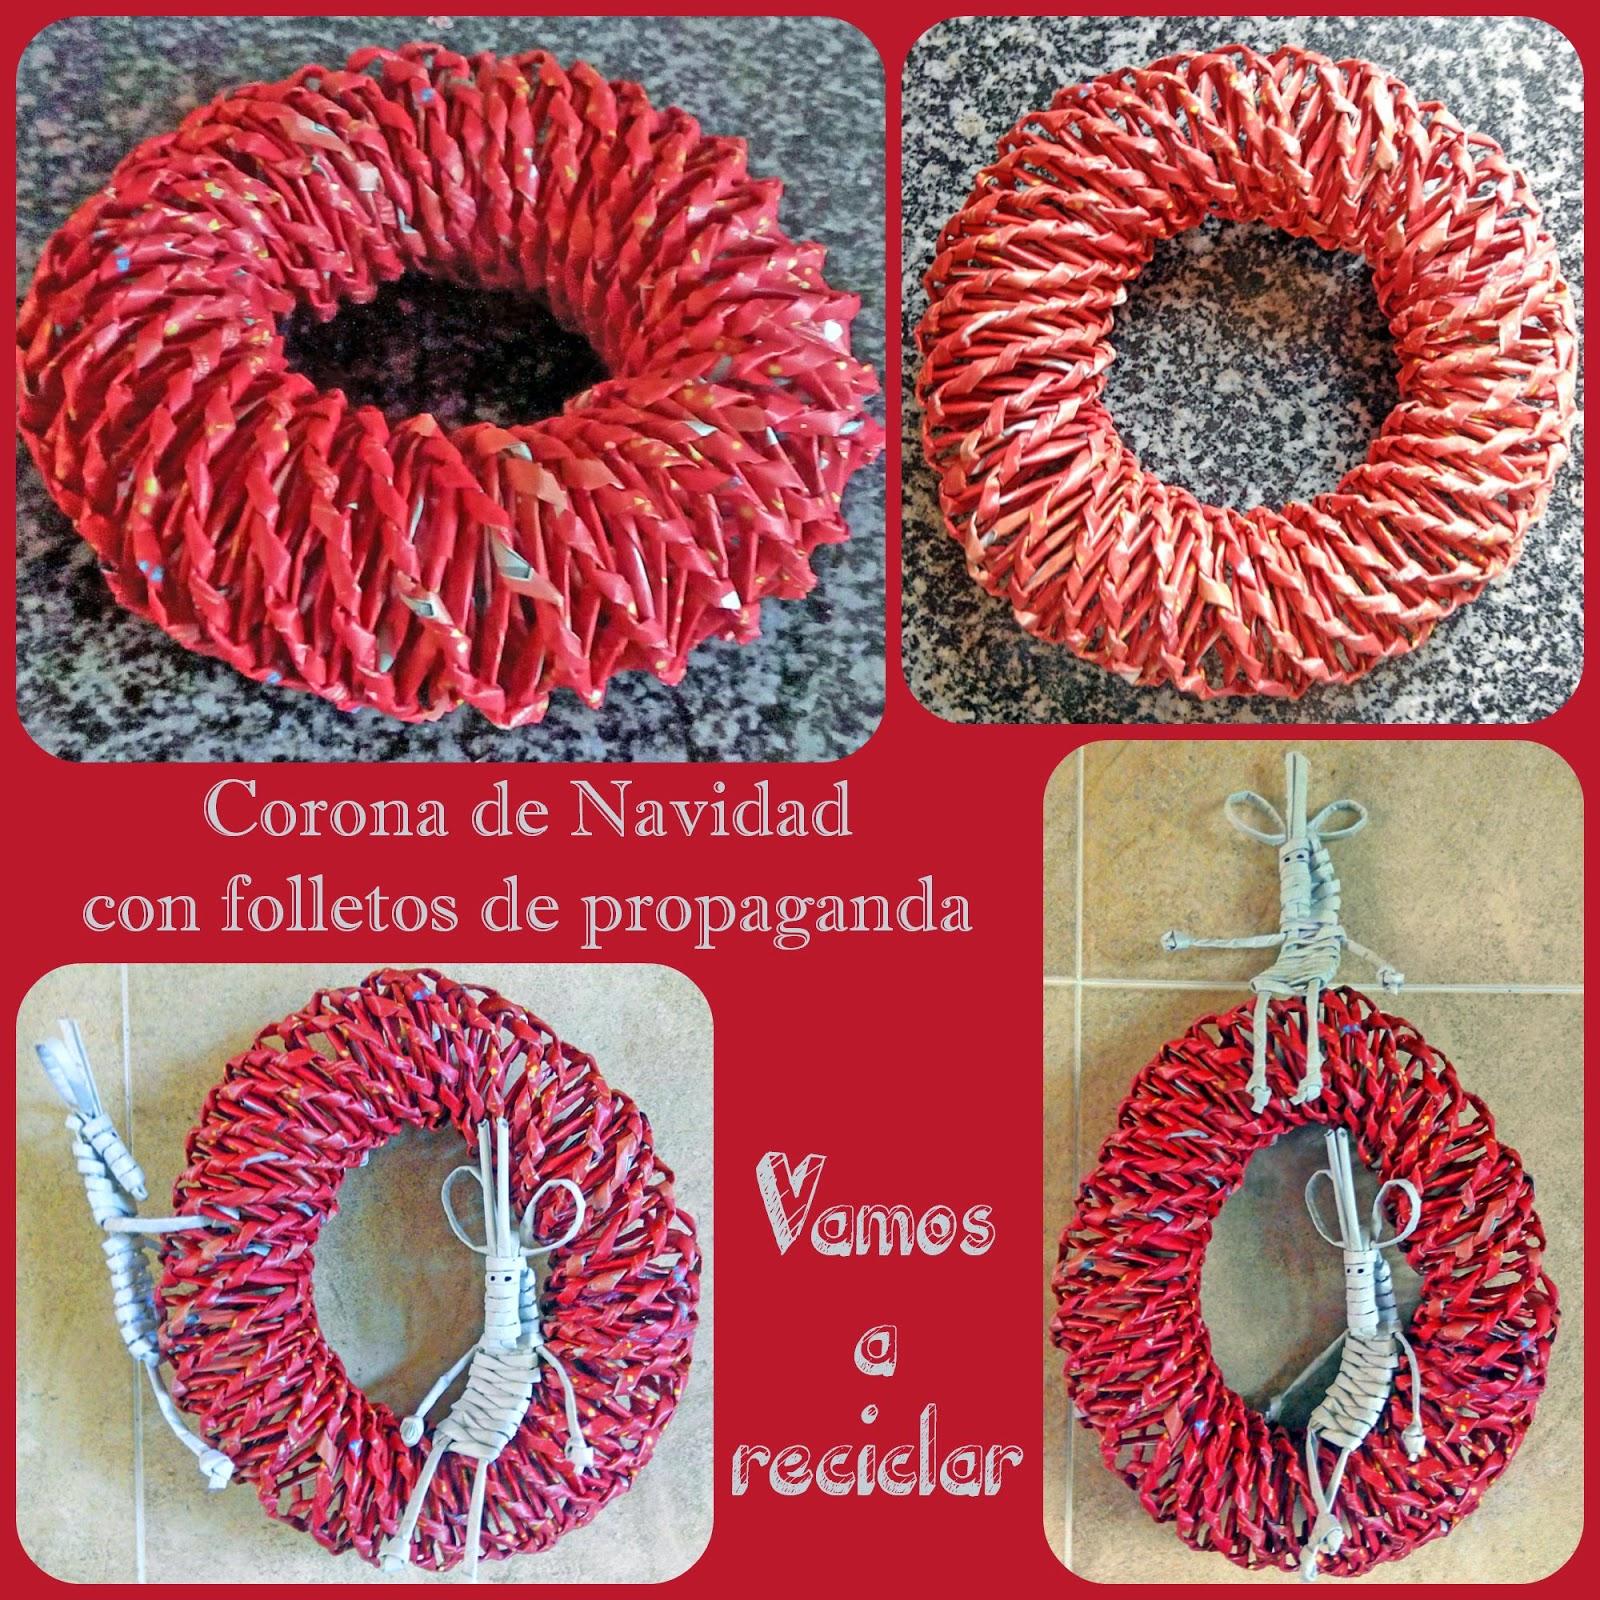 Corona de navidad reciclada aprender manualidades es for Facilisimo com manualidades